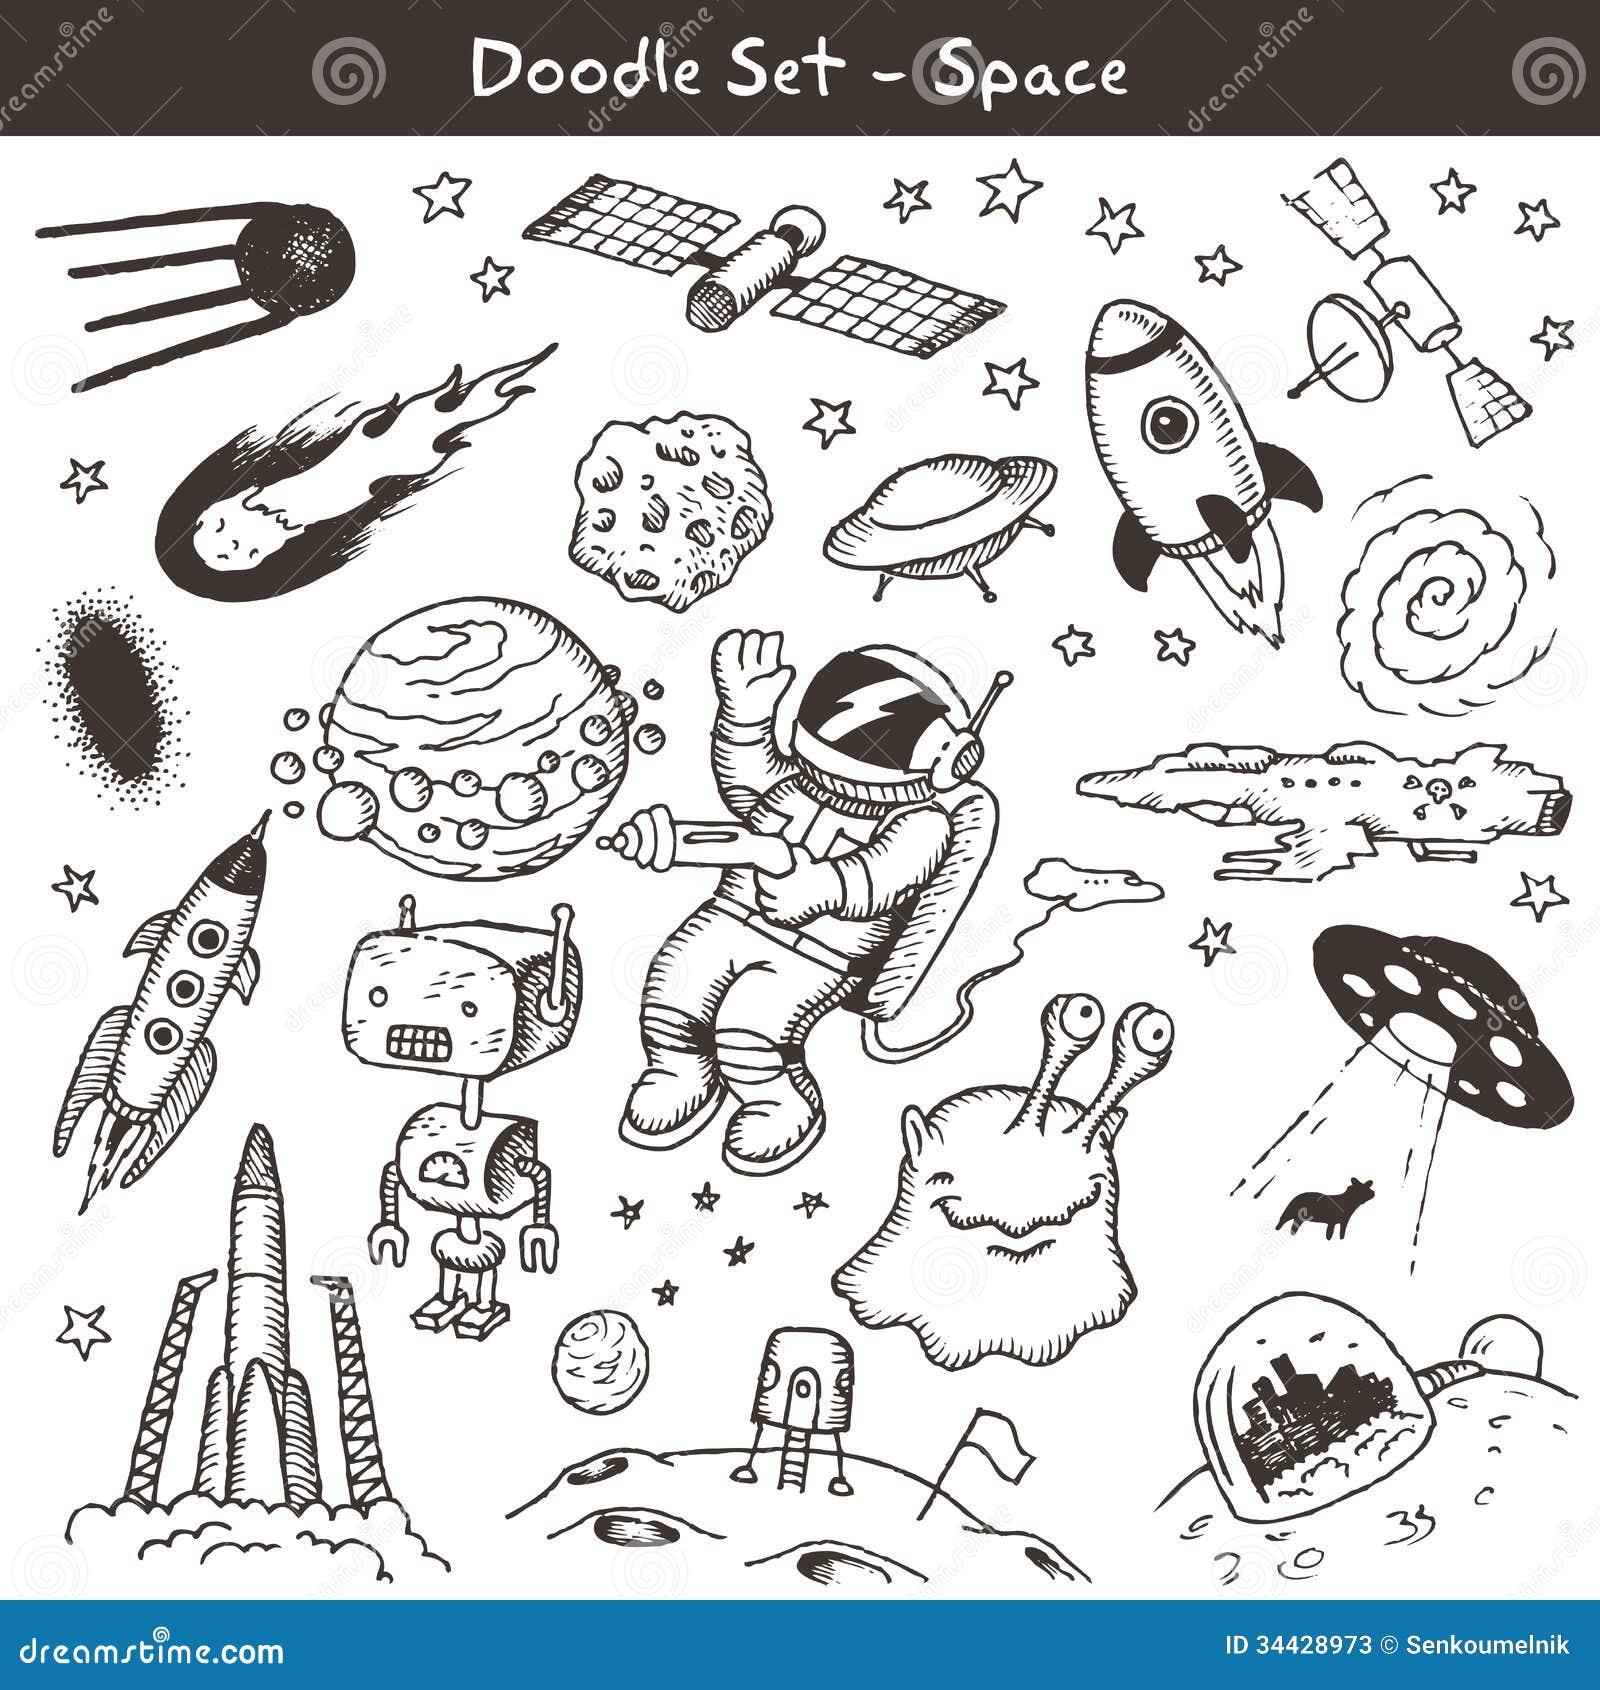 Big set of hand drawn space doodles. Vector illustration.